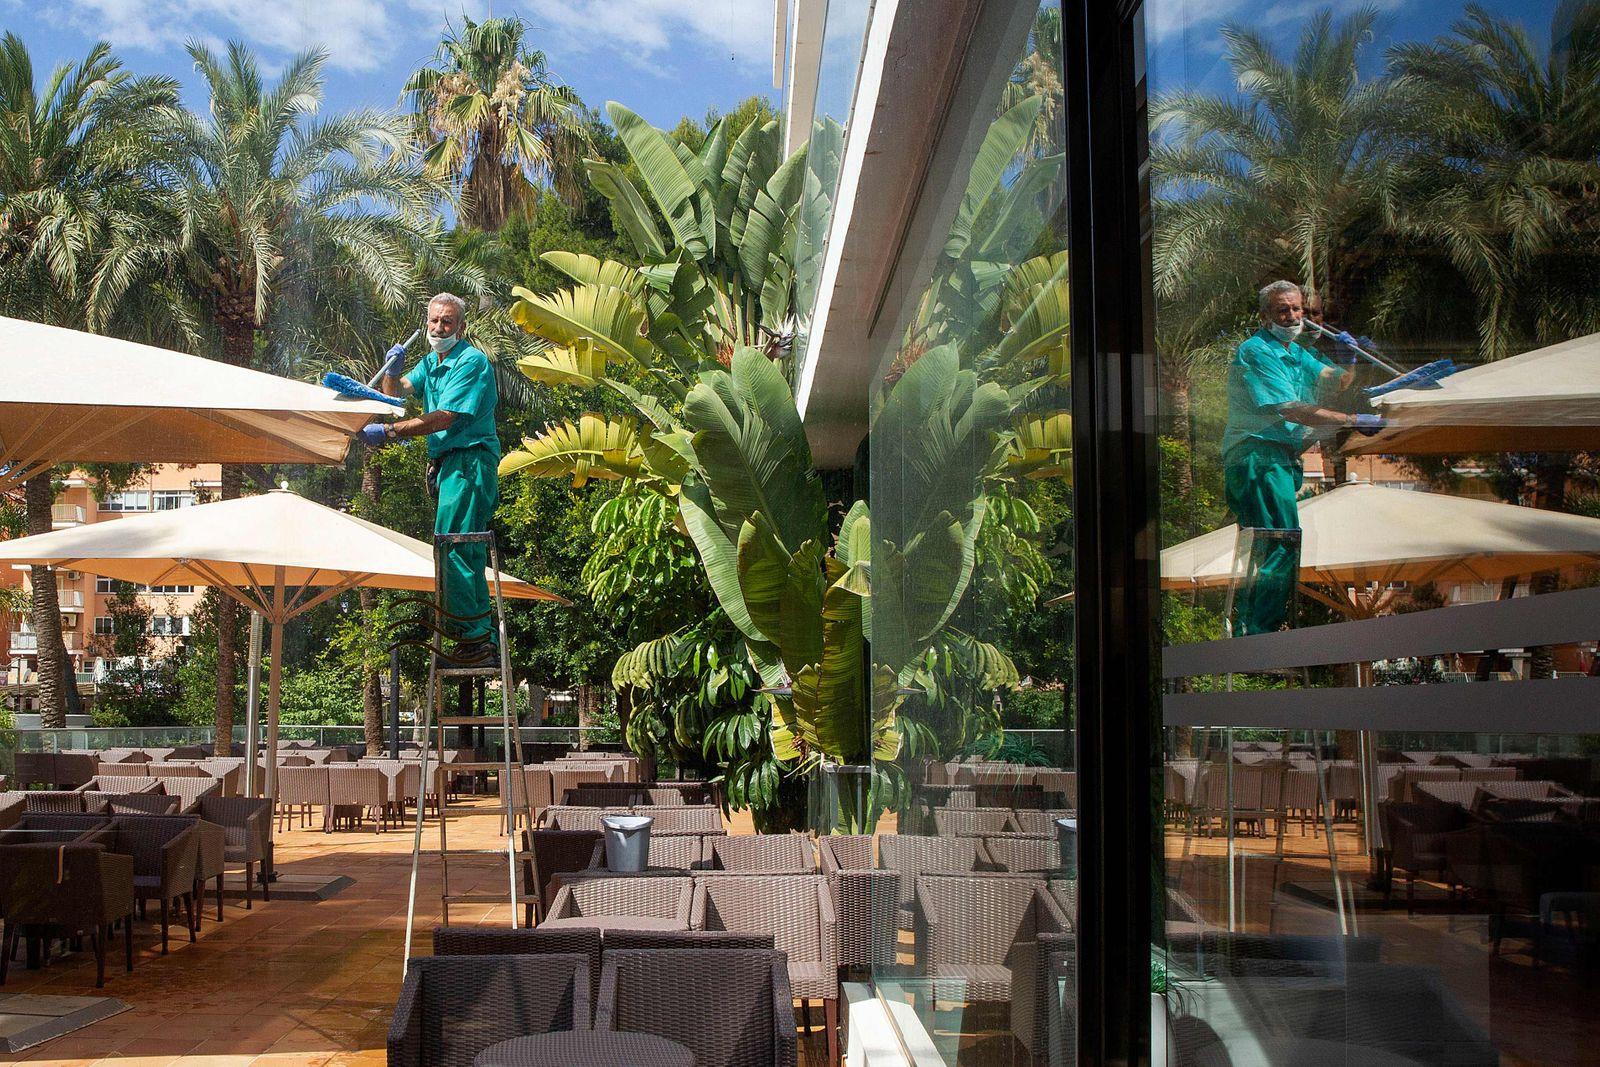 SPAIN-HEALTH-VIRUS-TOURISM-HOTEL